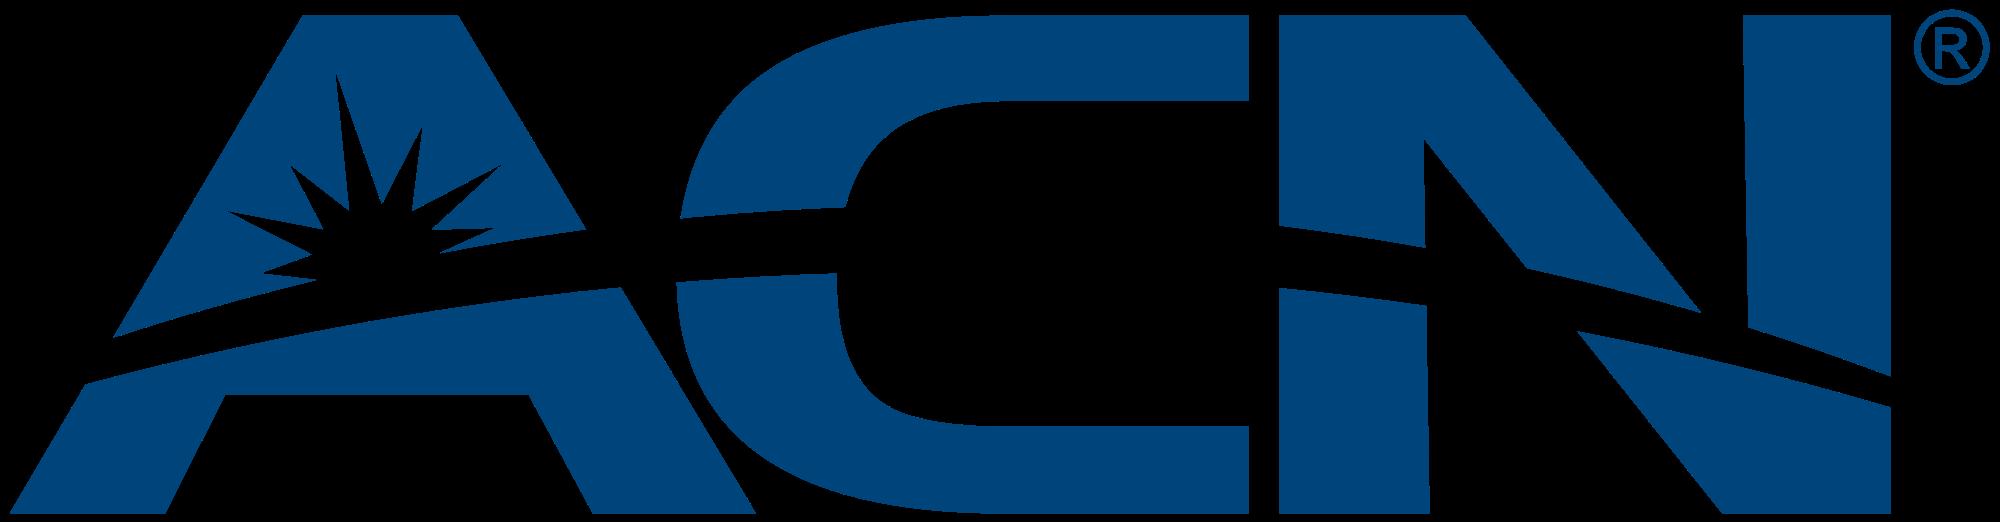 Logo Acn PNG-PlusPNG.com-2000 - Logo Acn PNG